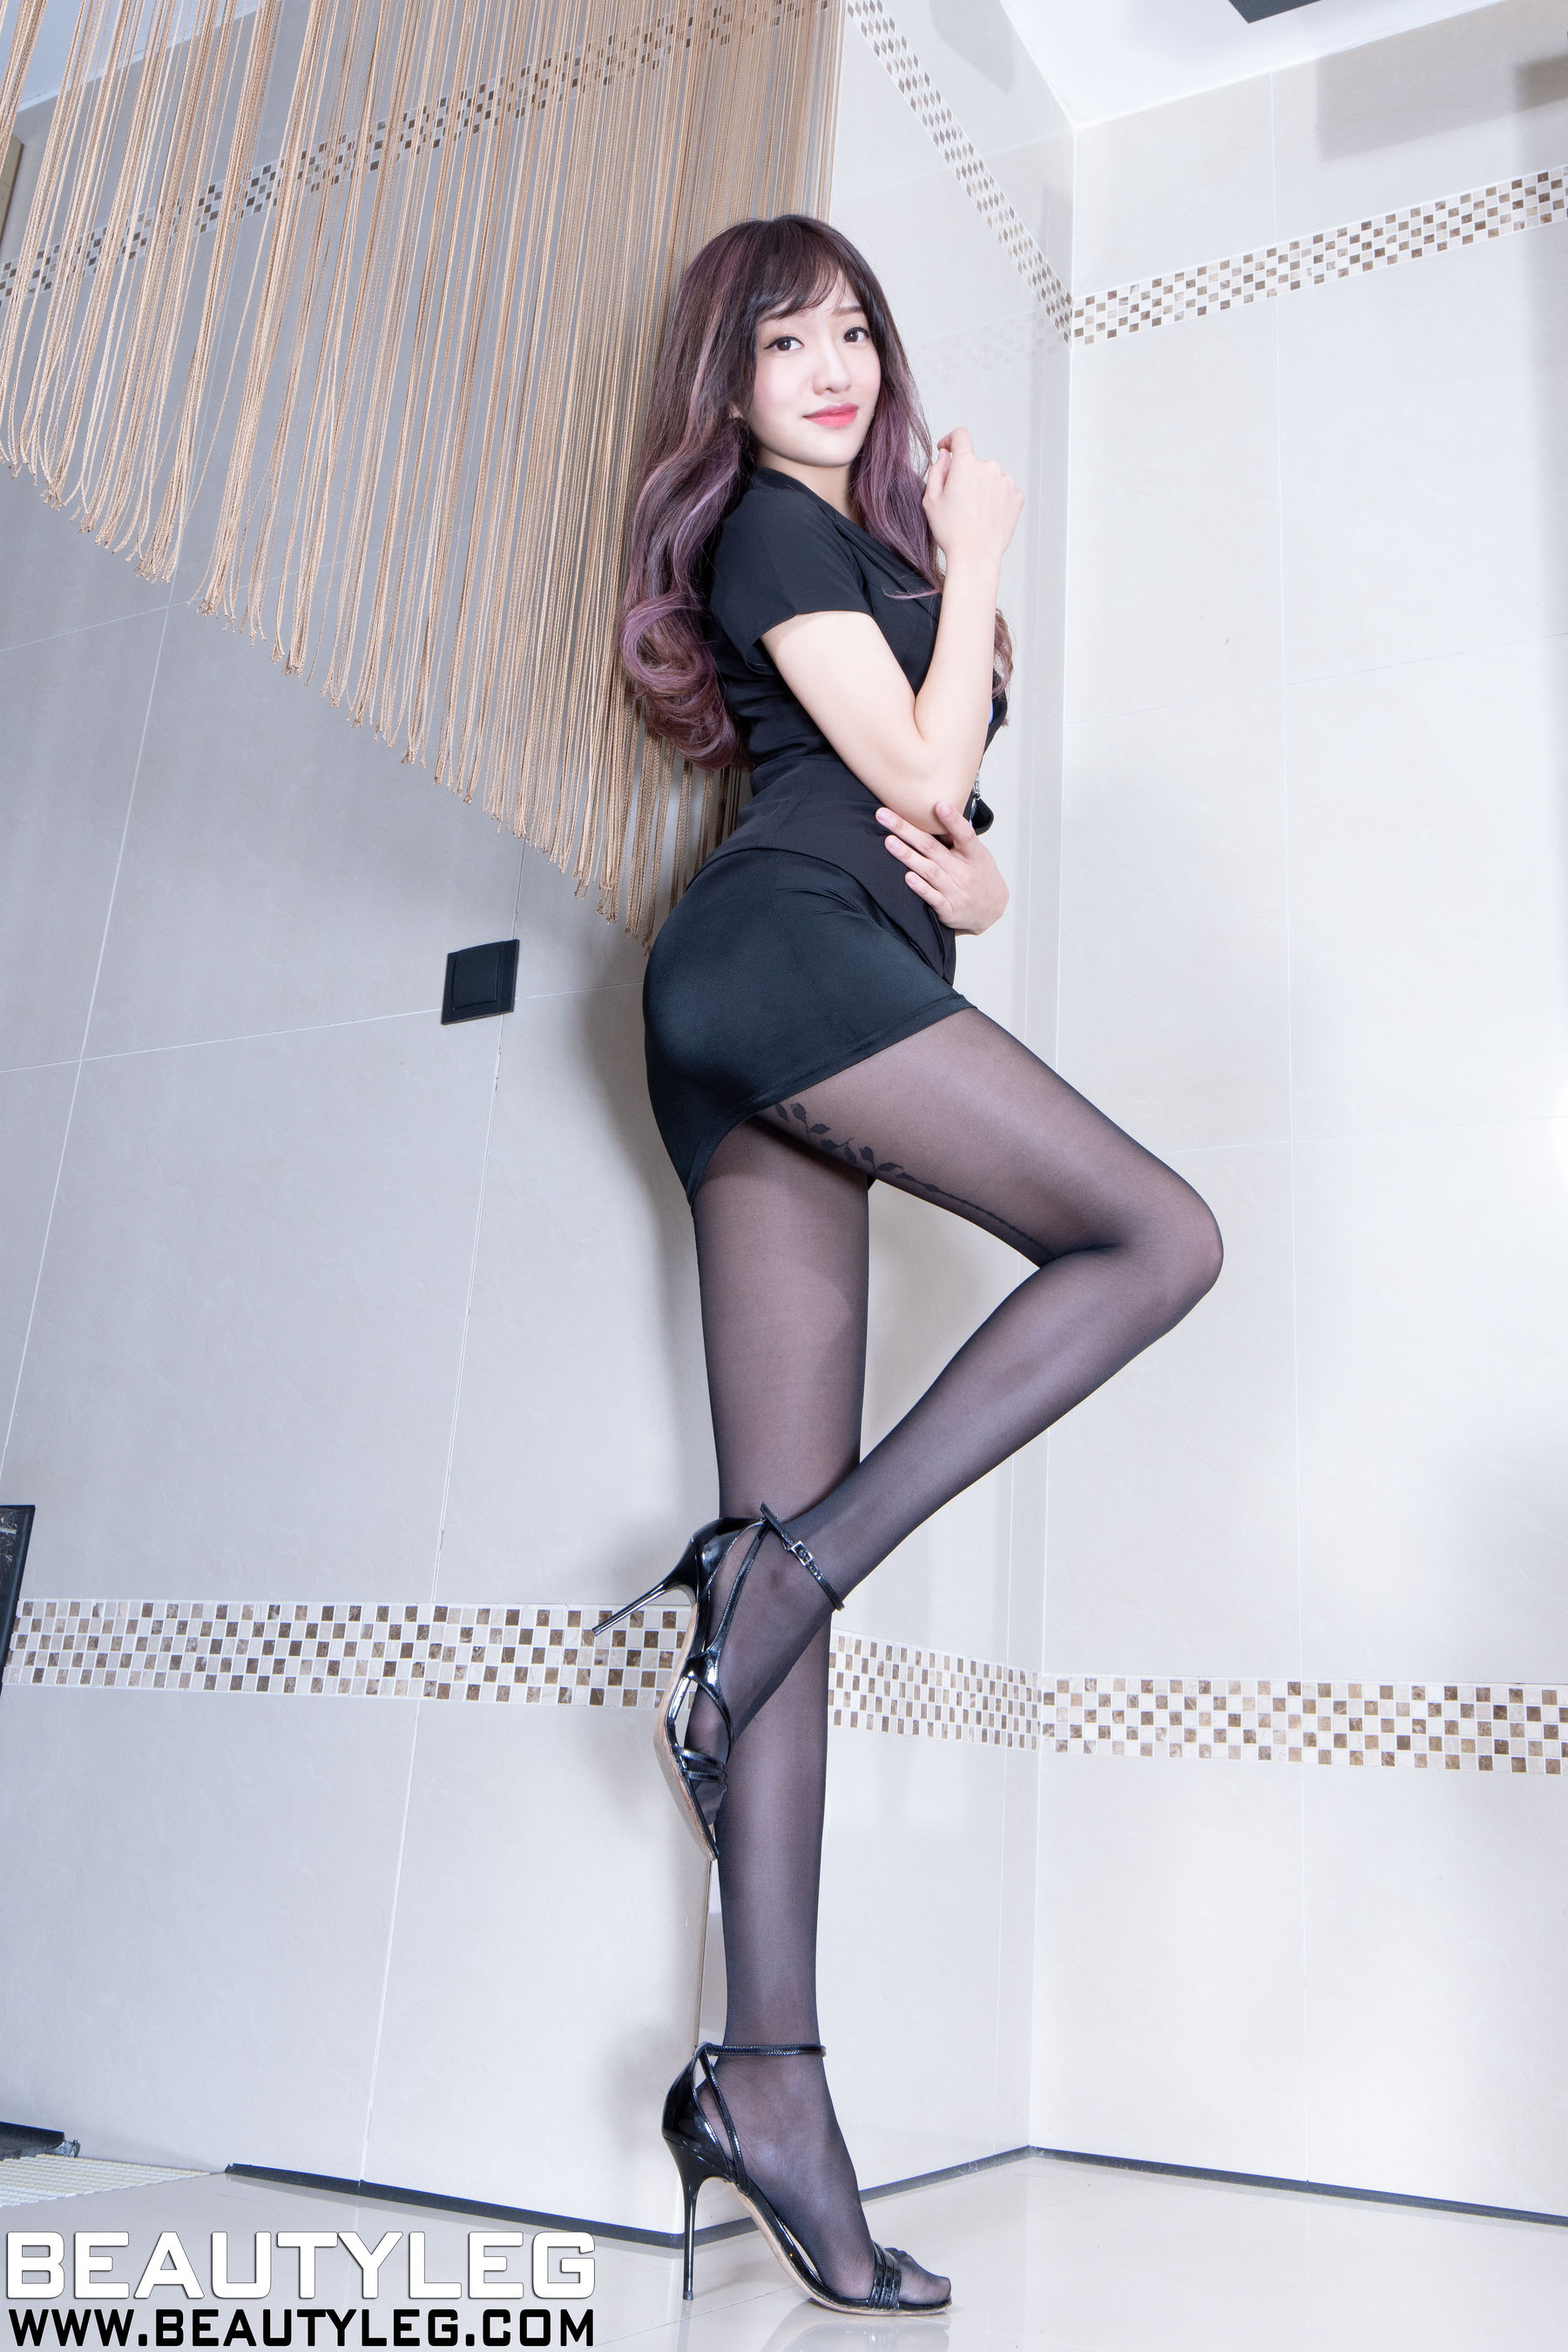 VOL.605 [Beautyleg]丝袜制服:欣洁(腿模Celia)超高清个人性感漂亮大图(48P)